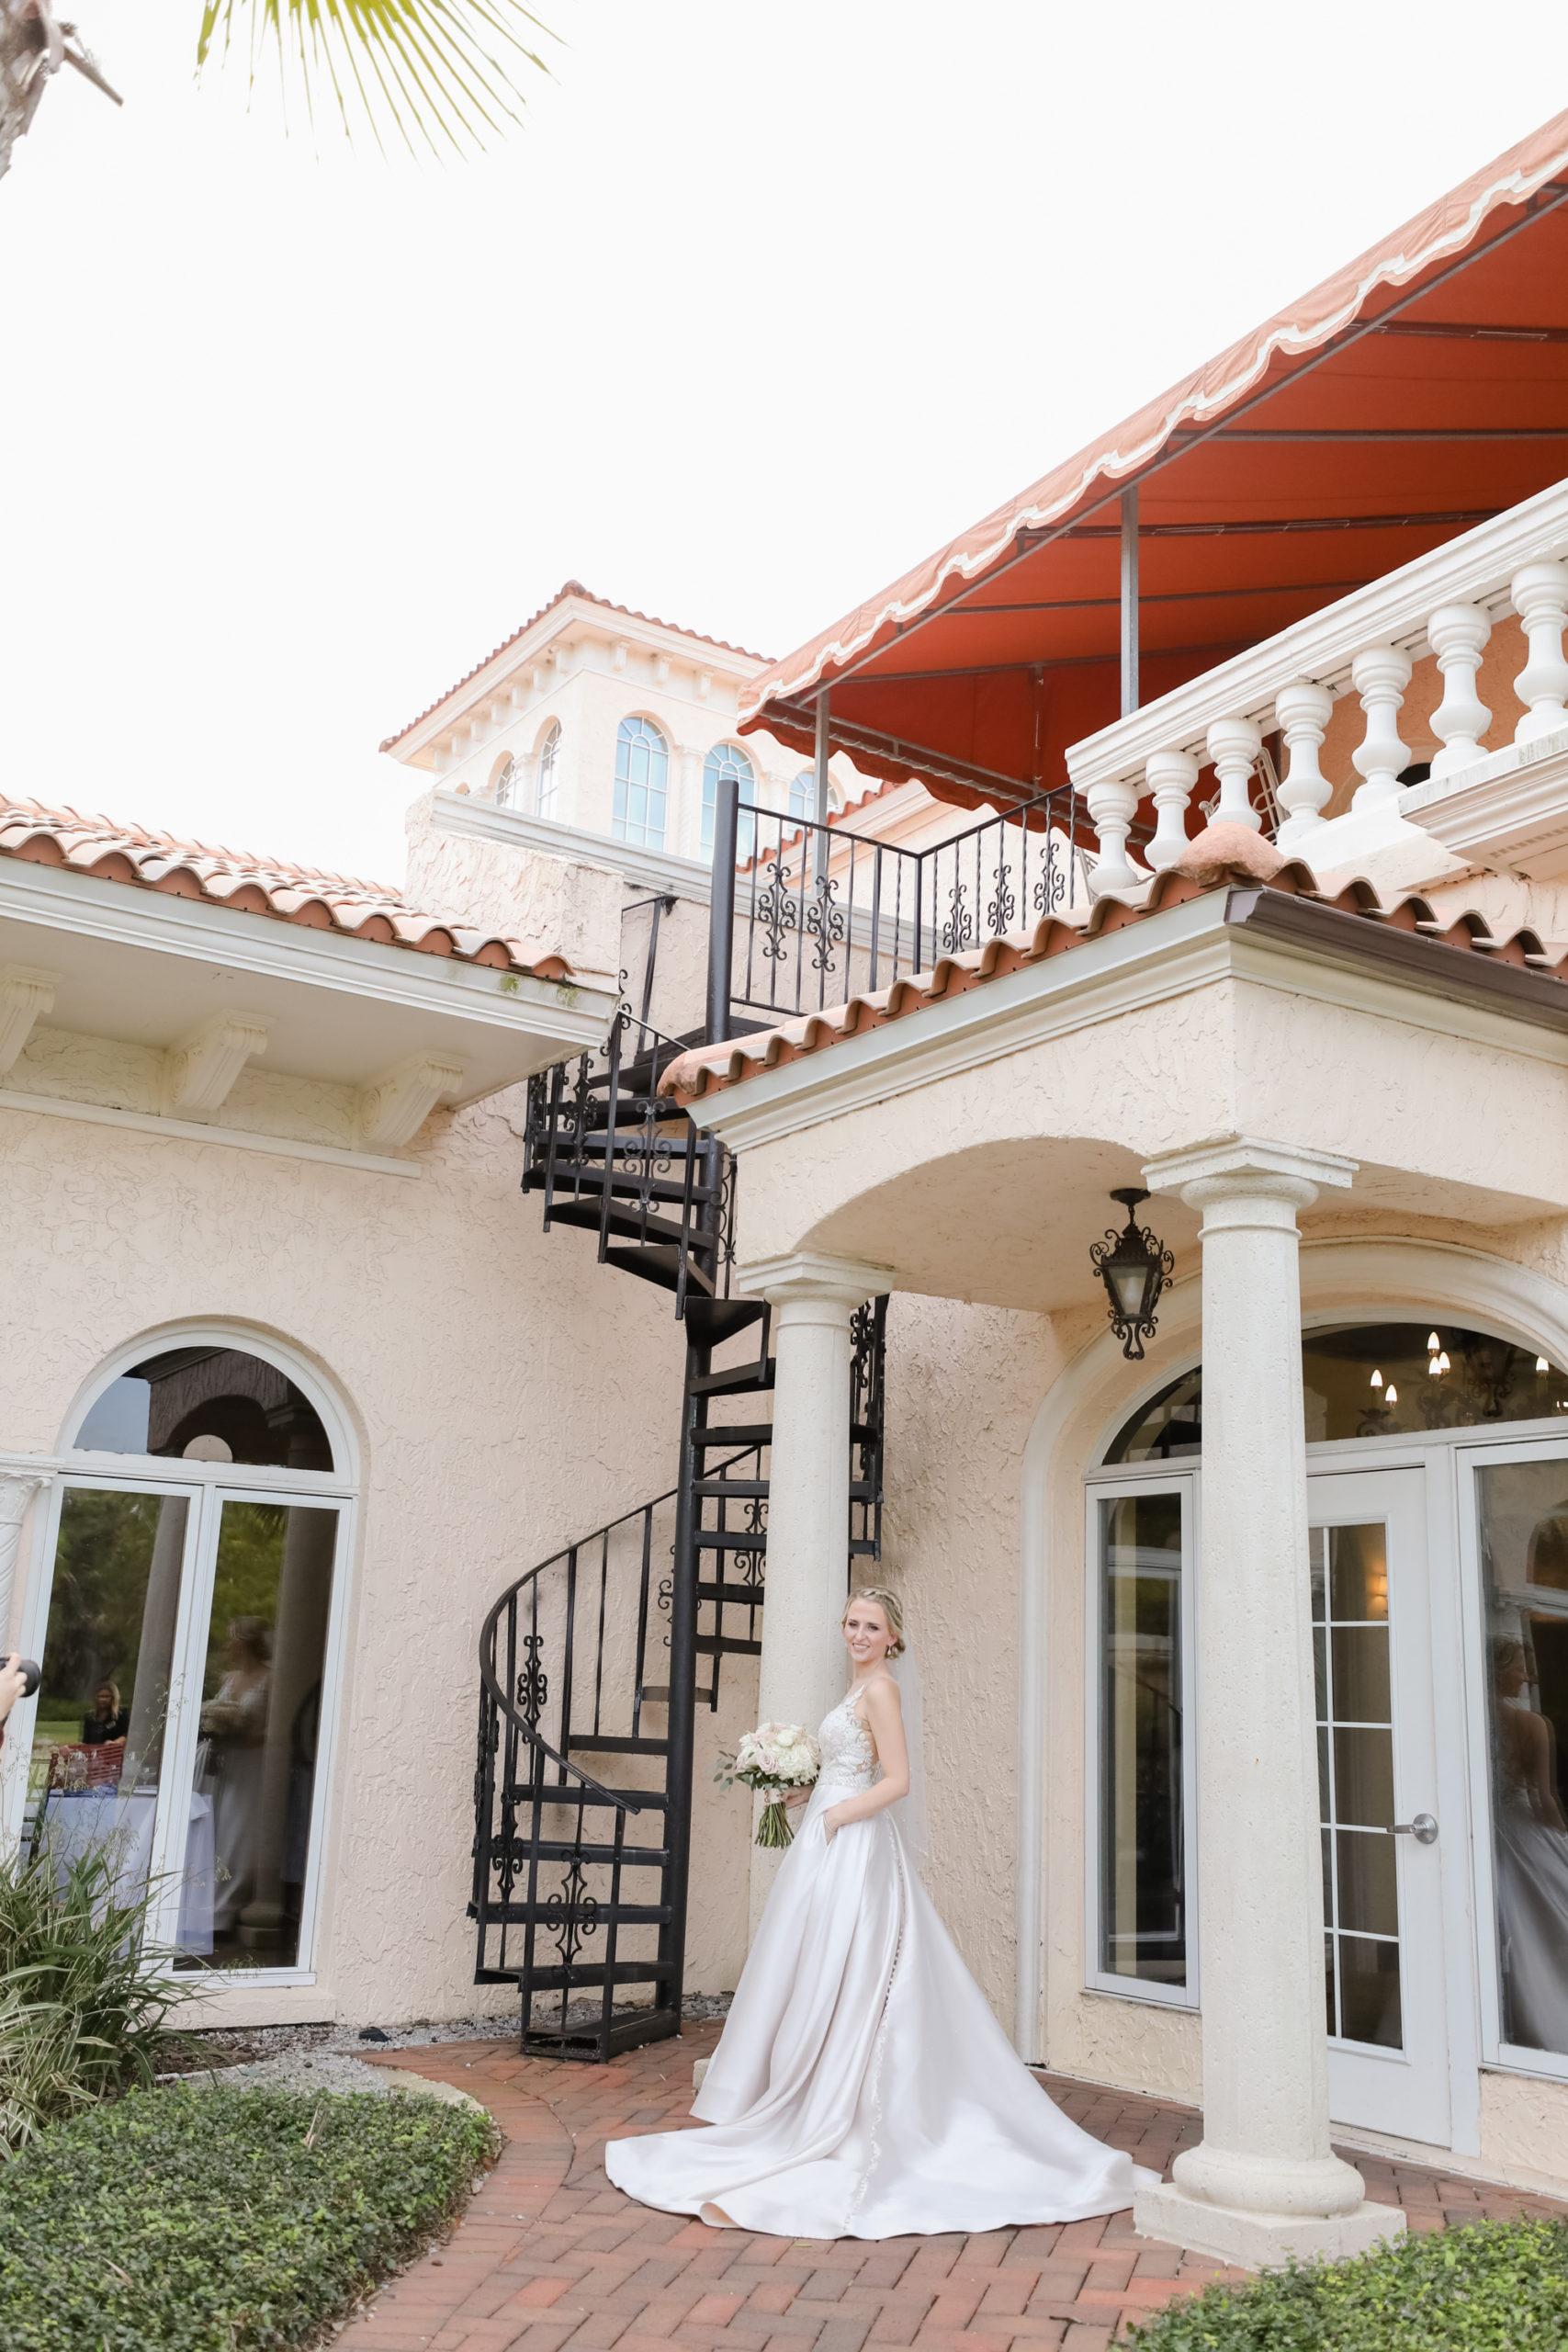 Tampa Wedding Venue Avila Golf & Country Club | White Allure Ballgown Wedding Dress with Long Train | Tampa Bay Wedding Photographer Lifelong Photography Studio